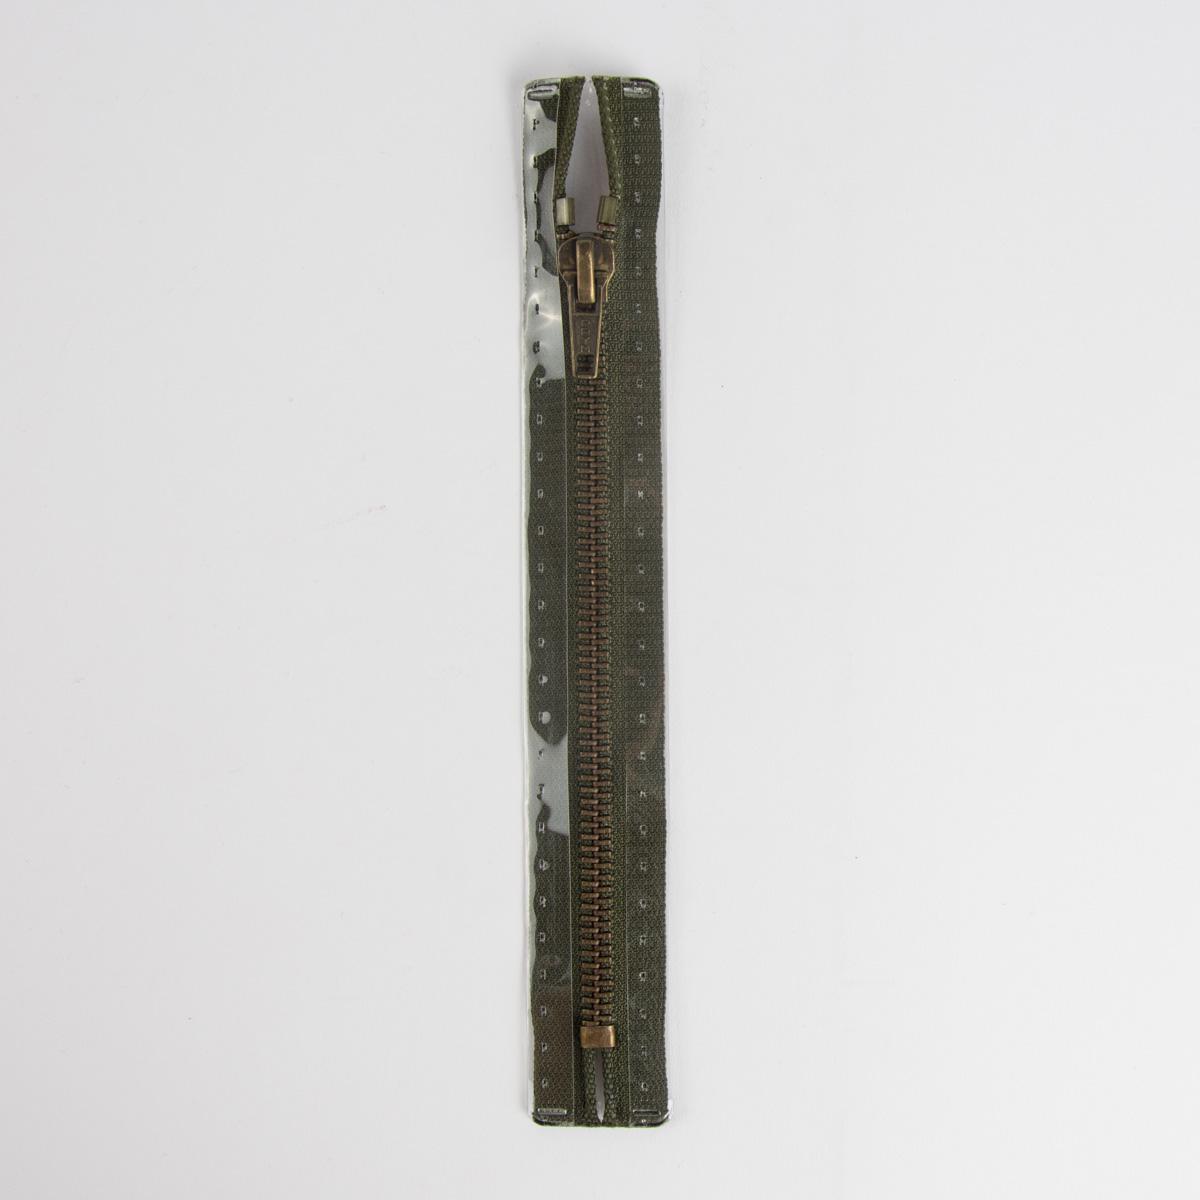 Reißverschluss M6 Typ 10 ut 20 cm am-fb Fla br-oliv